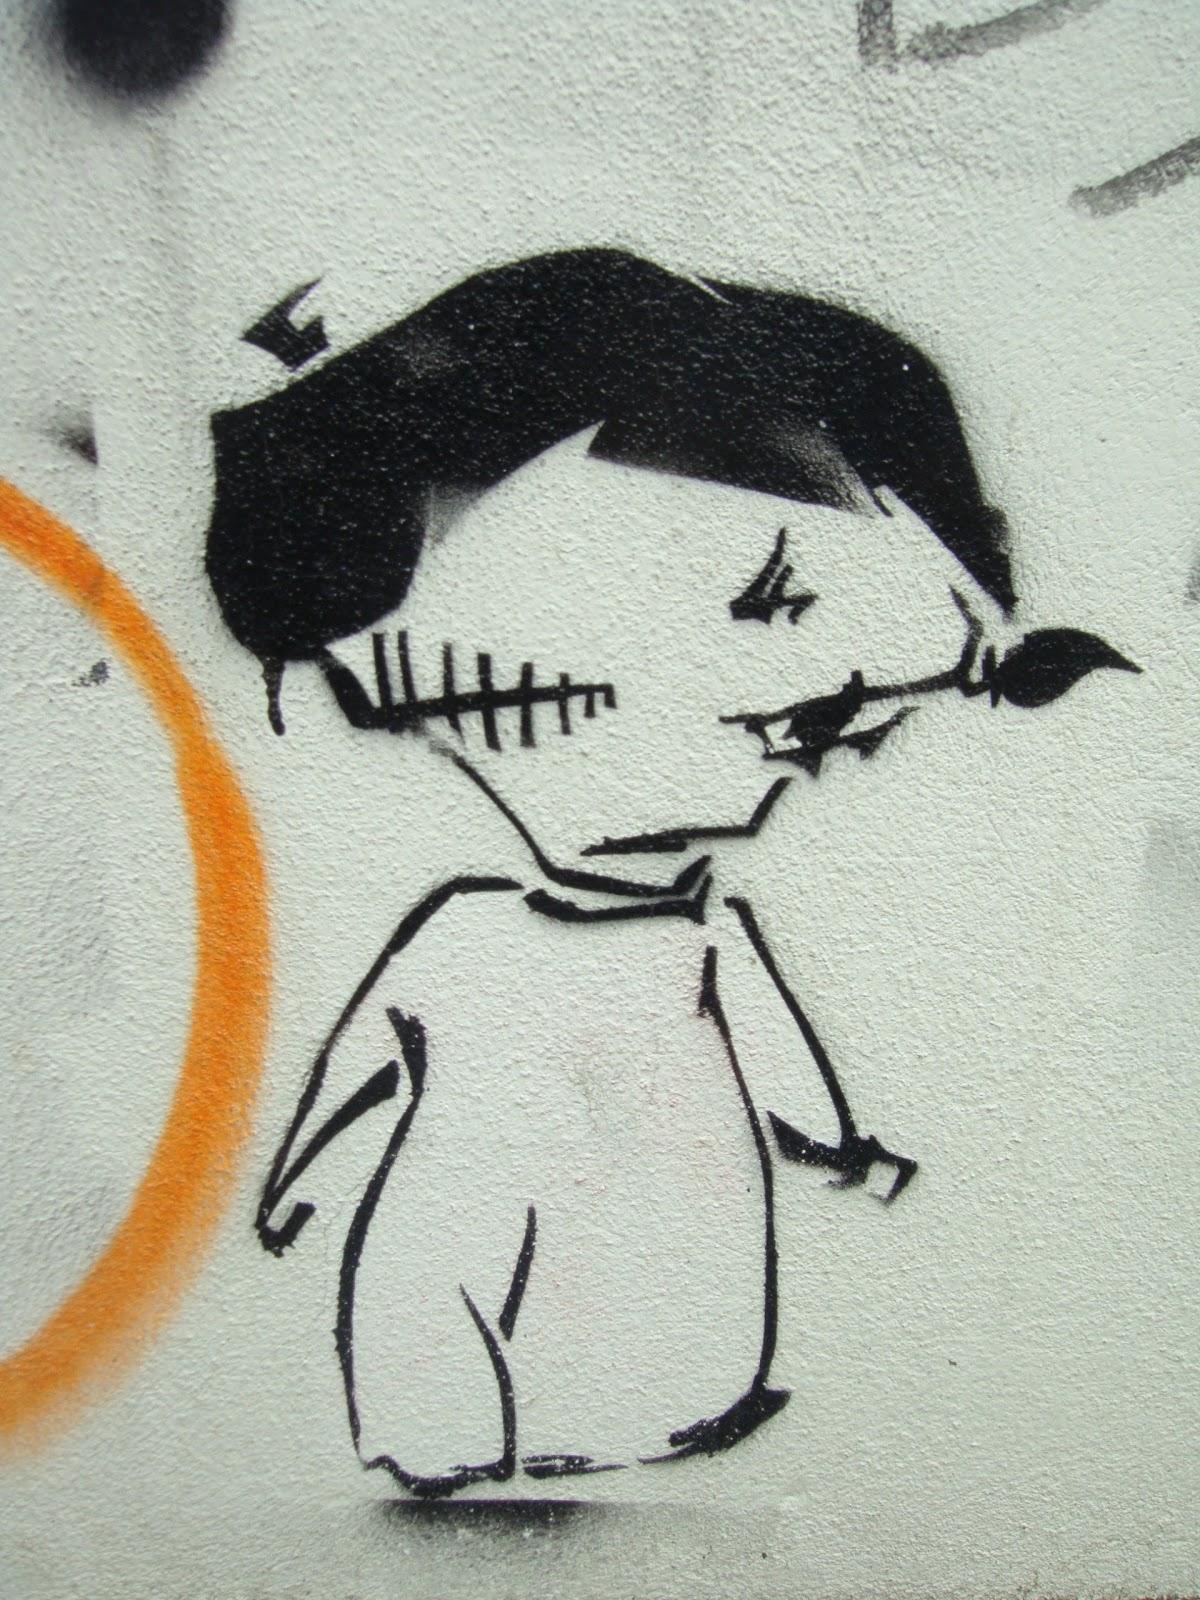 Graffiti Wallpaper Stencil Letters Ideas